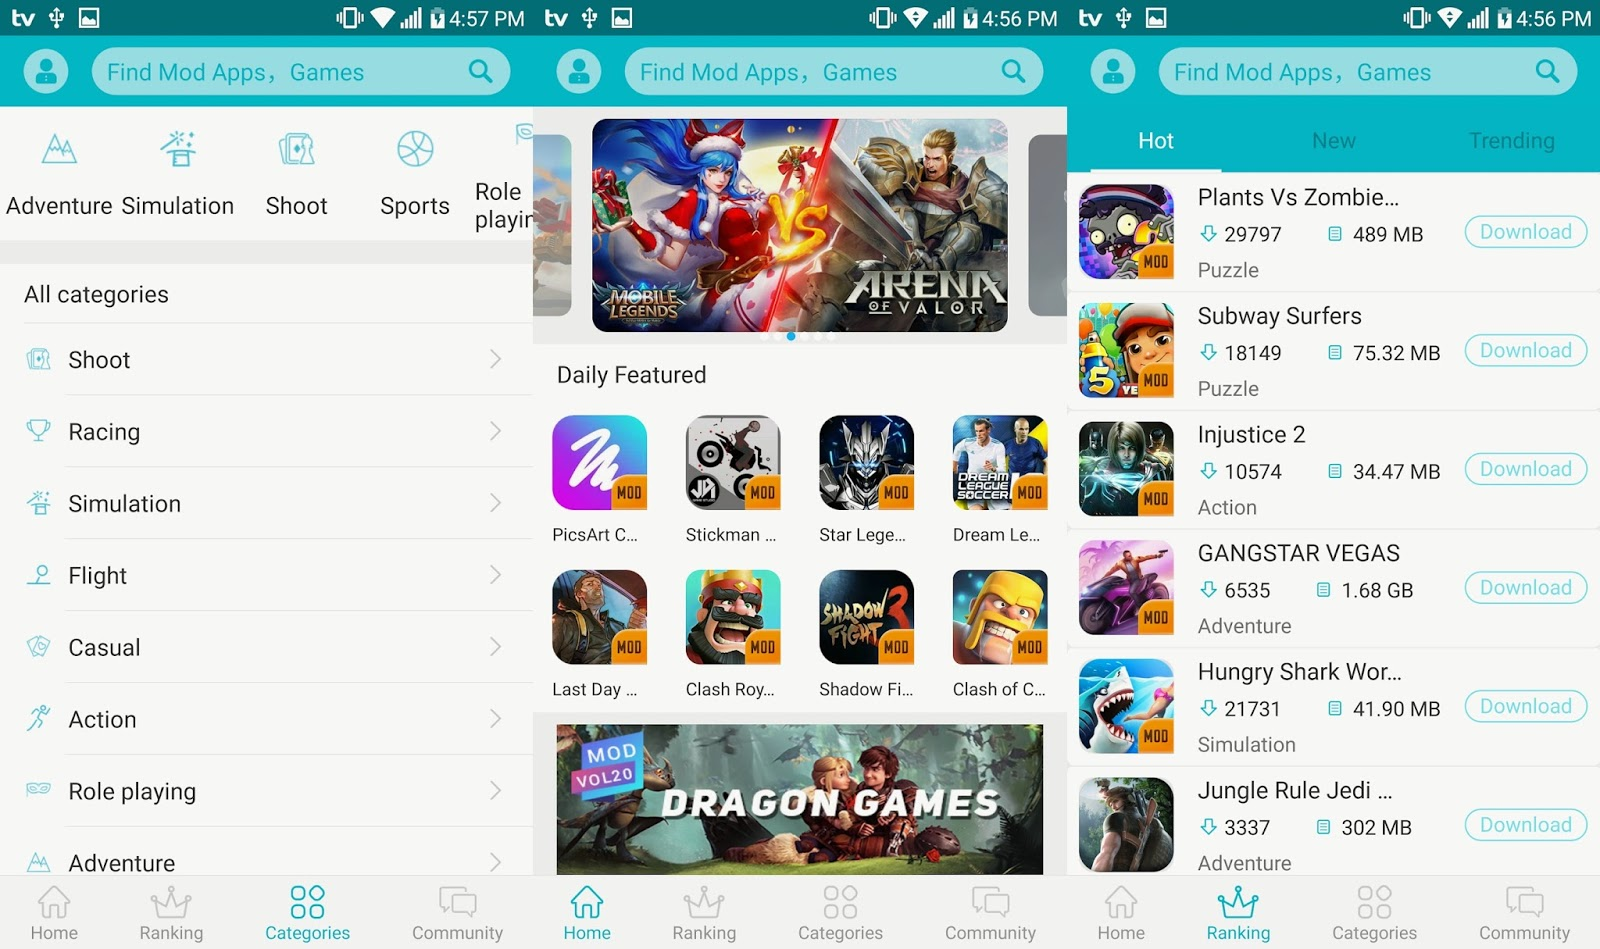 Descarga Juegos Hackeados Gratis Para Android 2018 Jeac Androidjeac